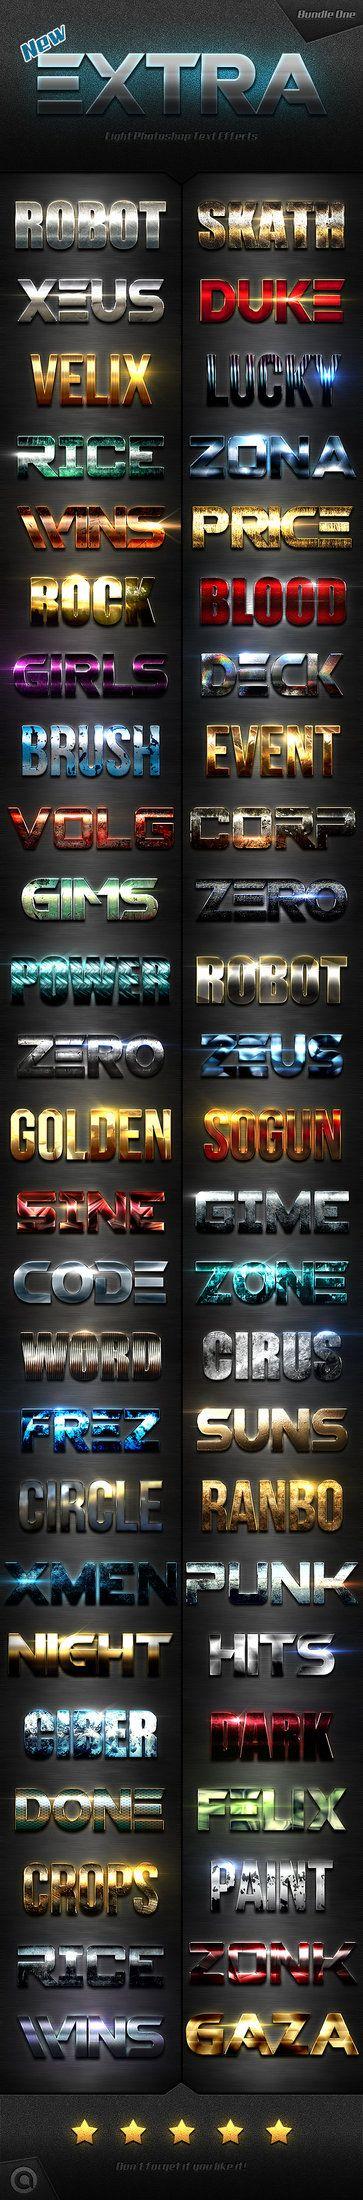 DOWNLOAD: goo gl/IEILDoNew Extra Light Text Effects Bundle